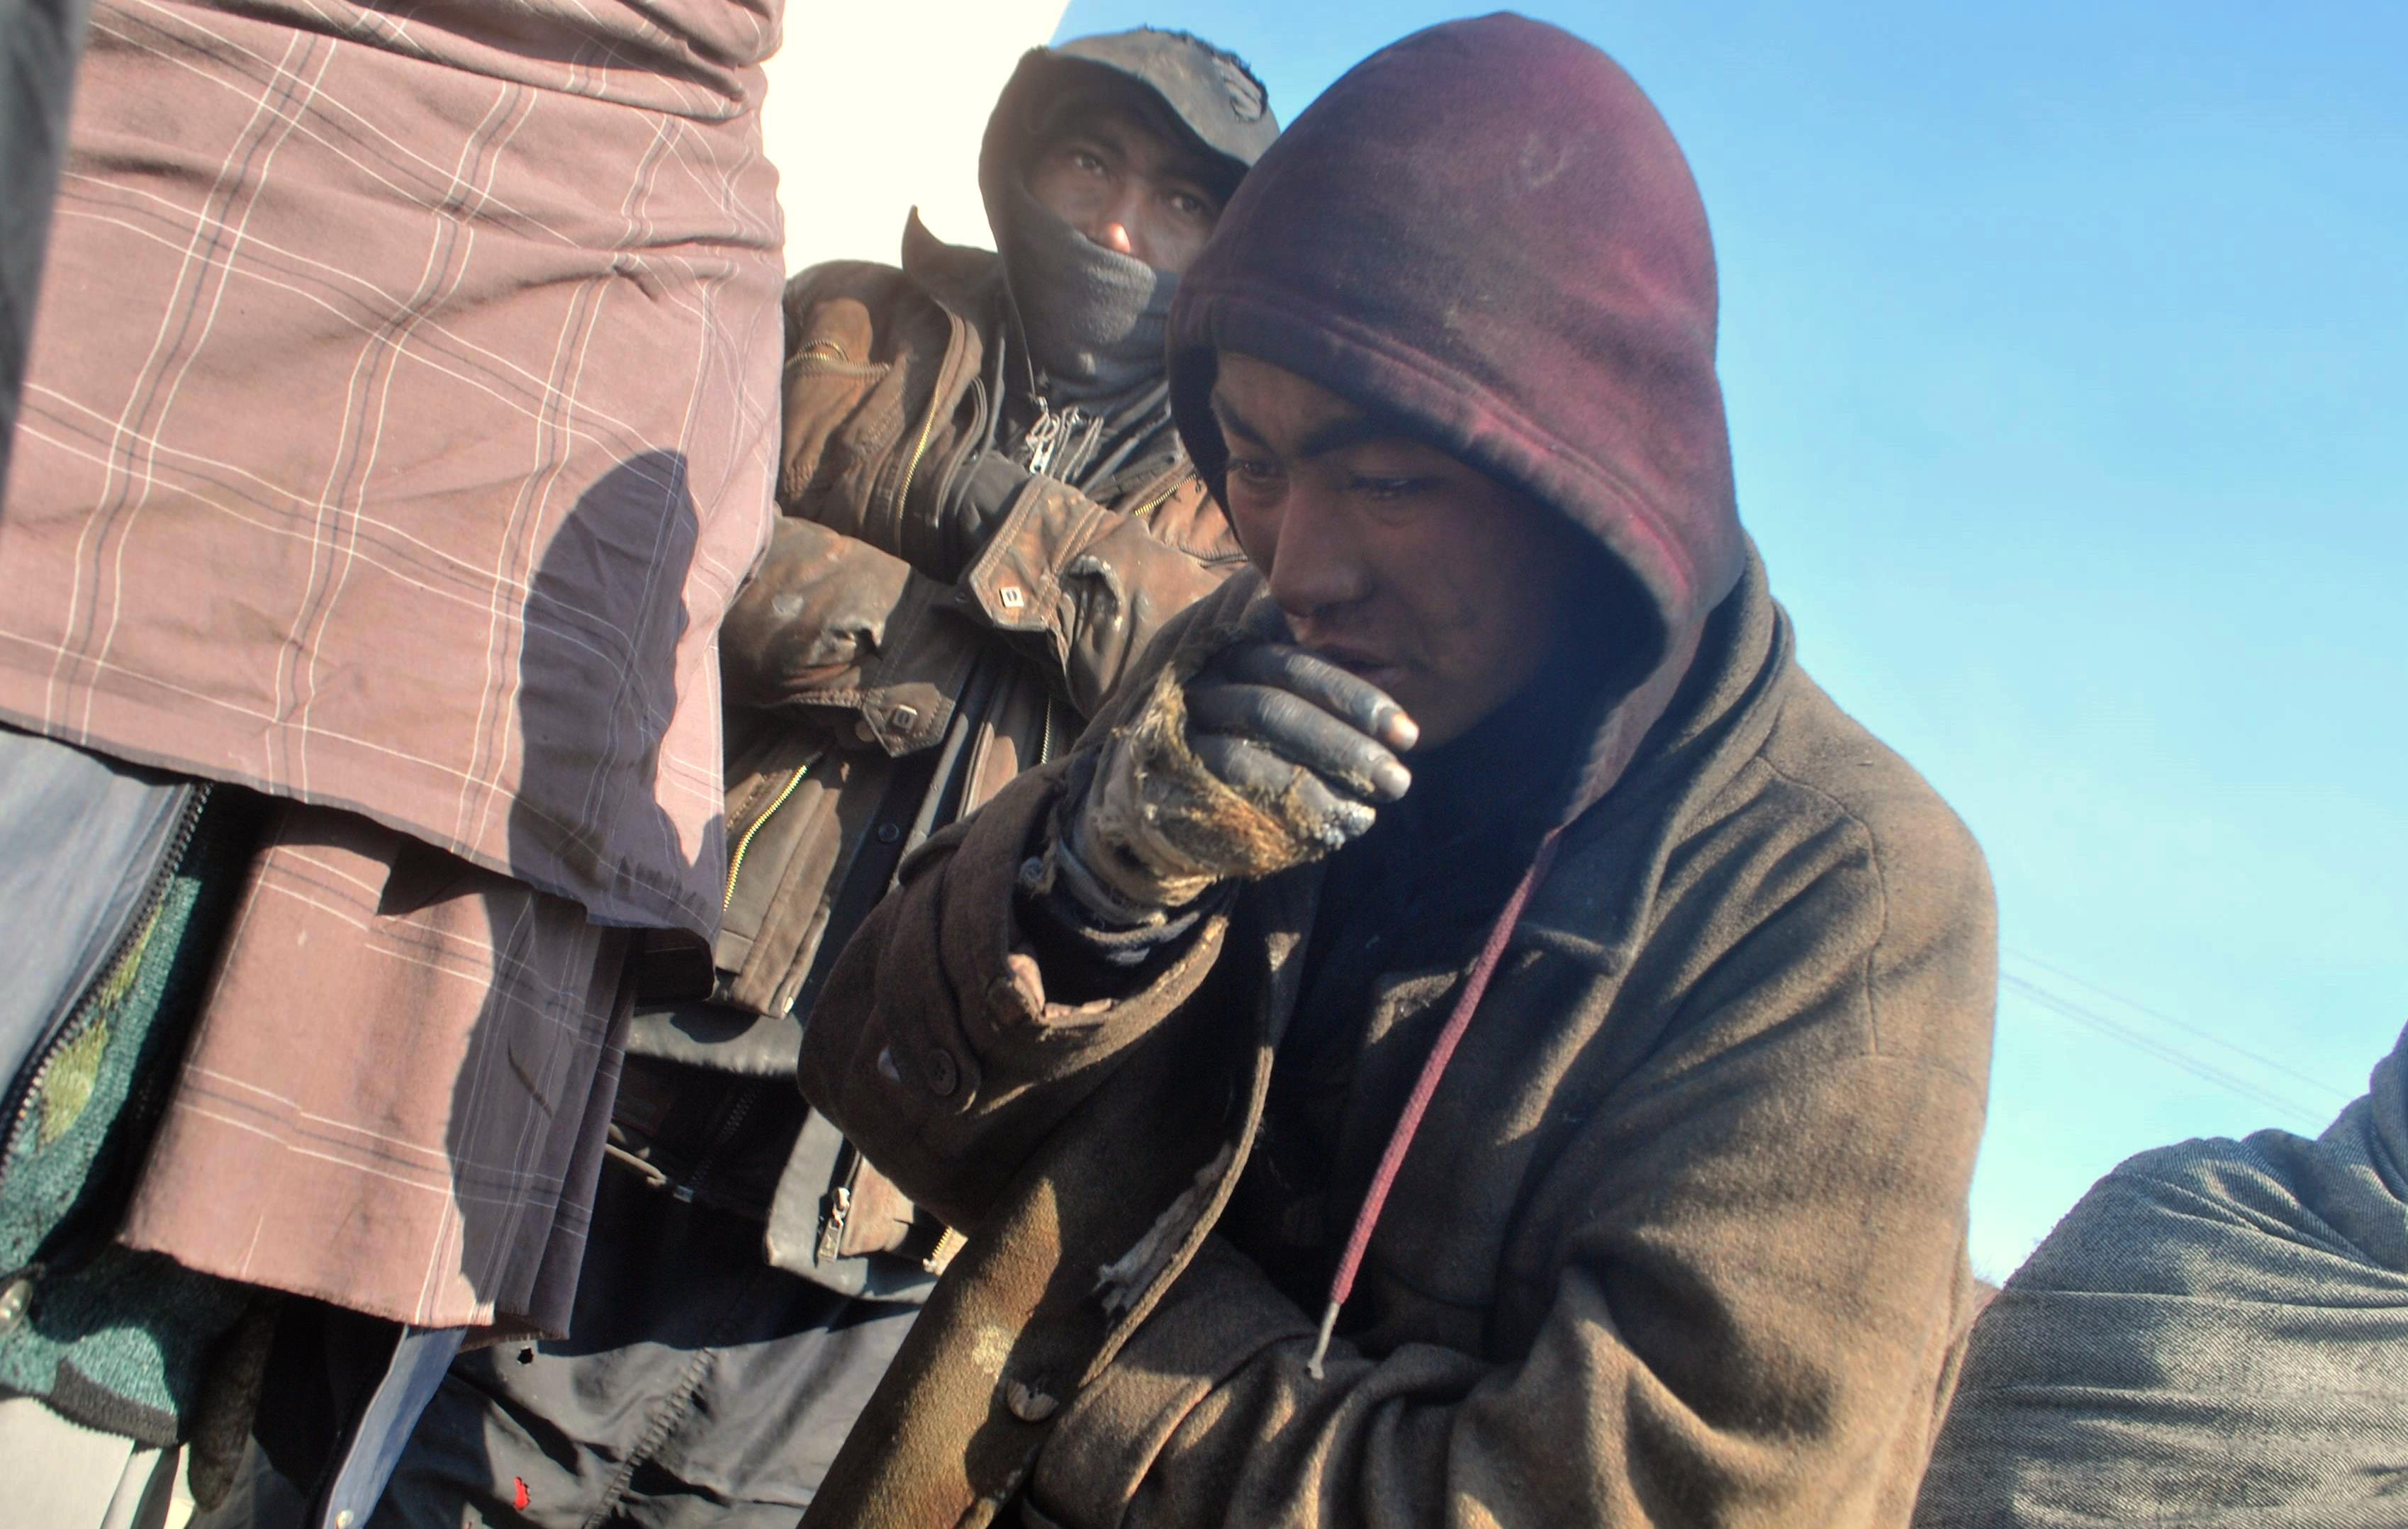 Taliban's illicit drug trade wreaking havoc on Afghanistan